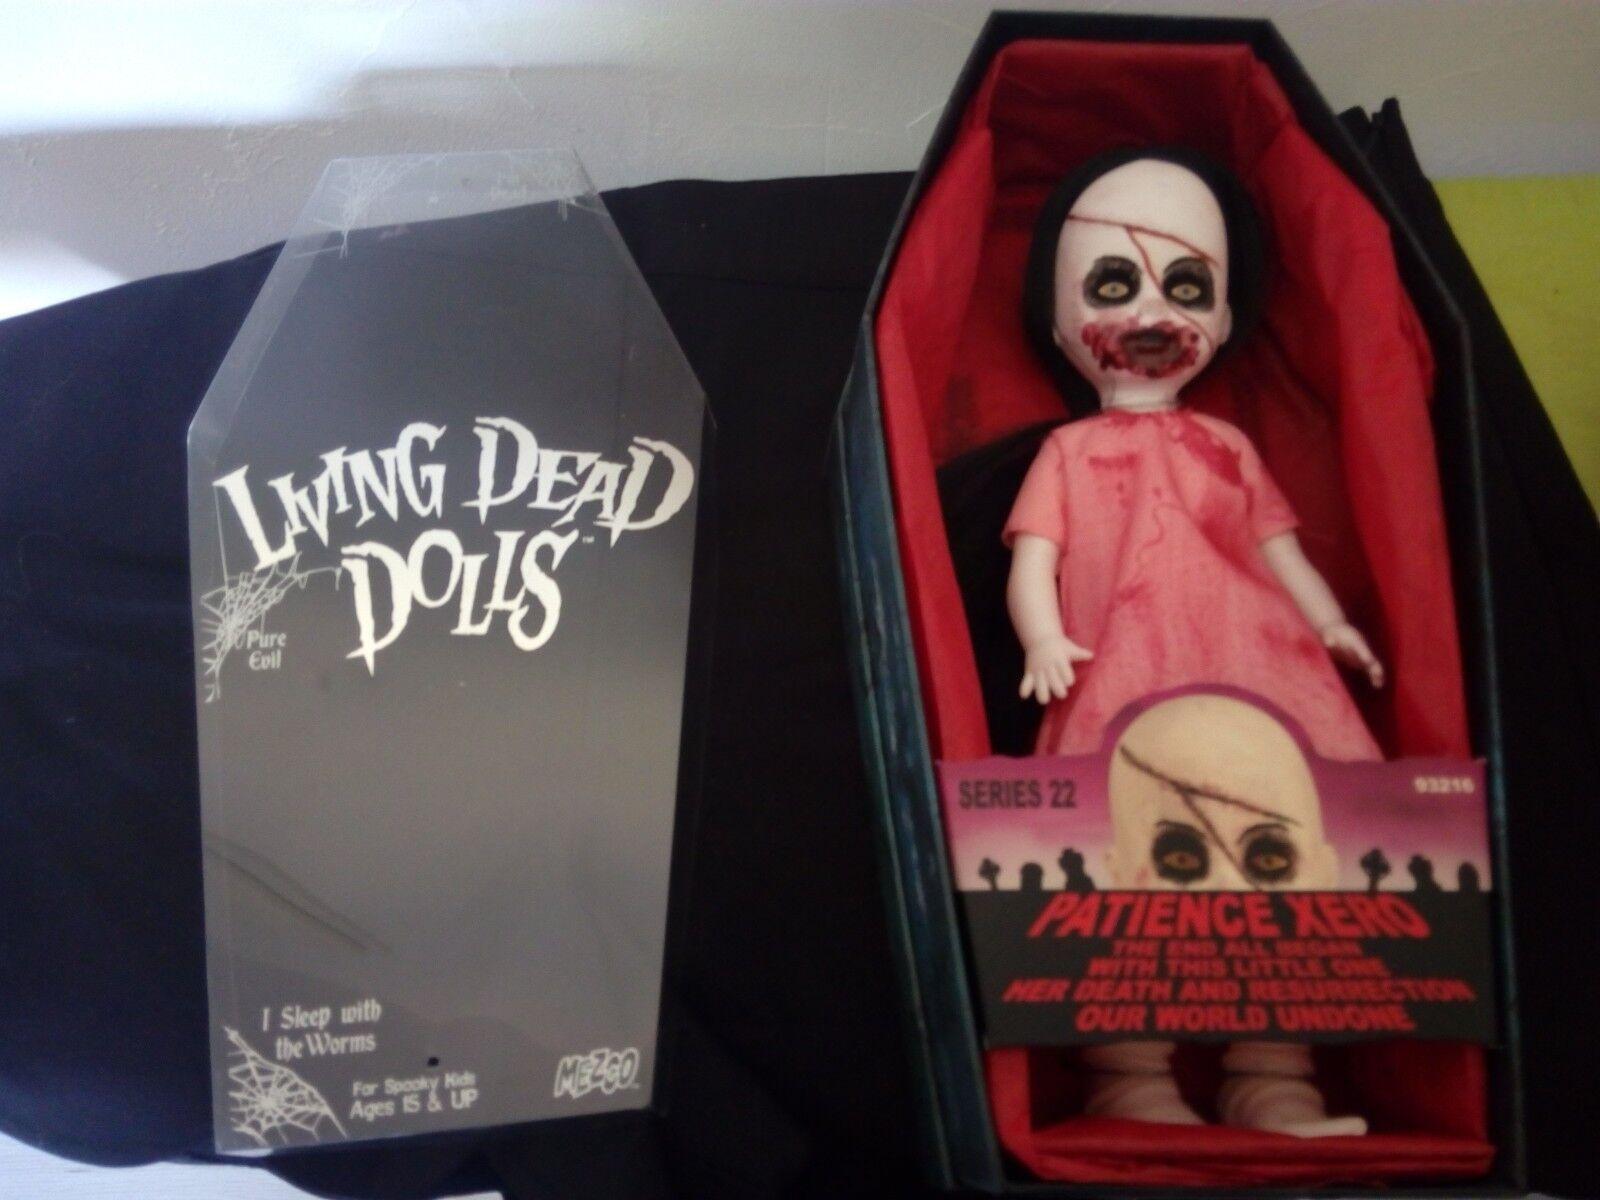 LIVING DEAD bambolaS EXCLUSIVE PATIENCE XERO COMPLET